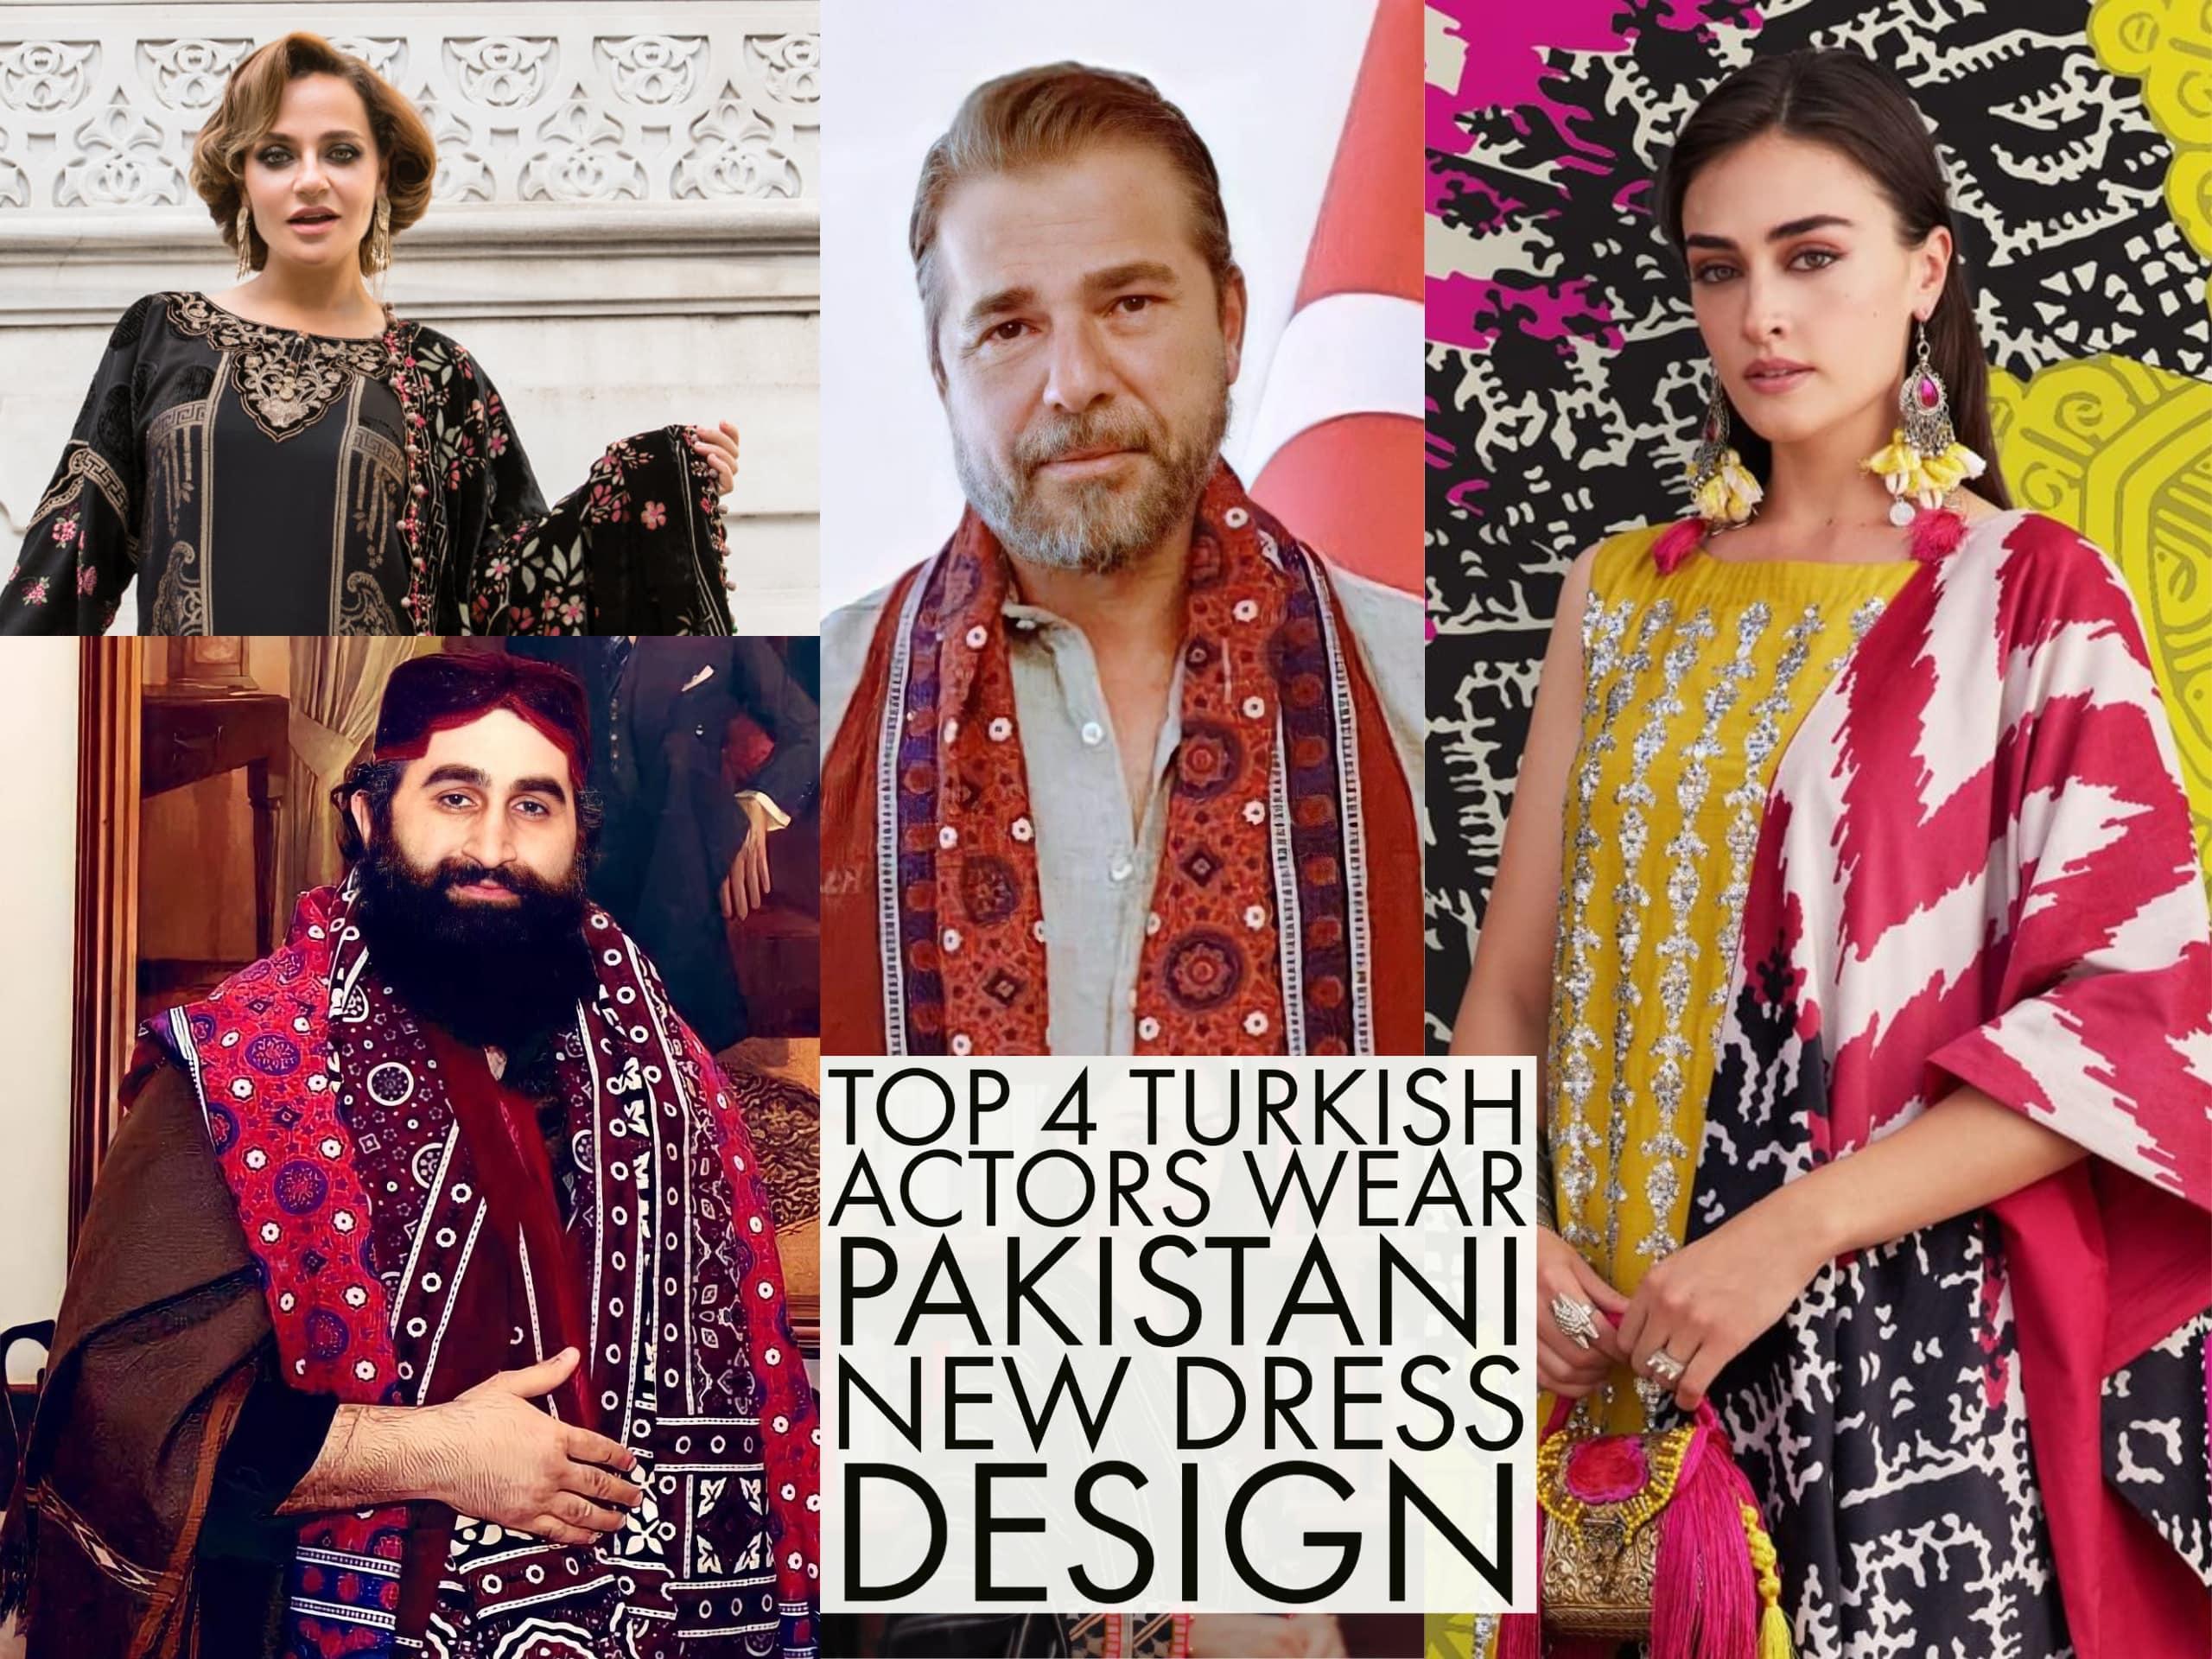 Top 4 Turkish Actors Wear Pakistani New Dress Design